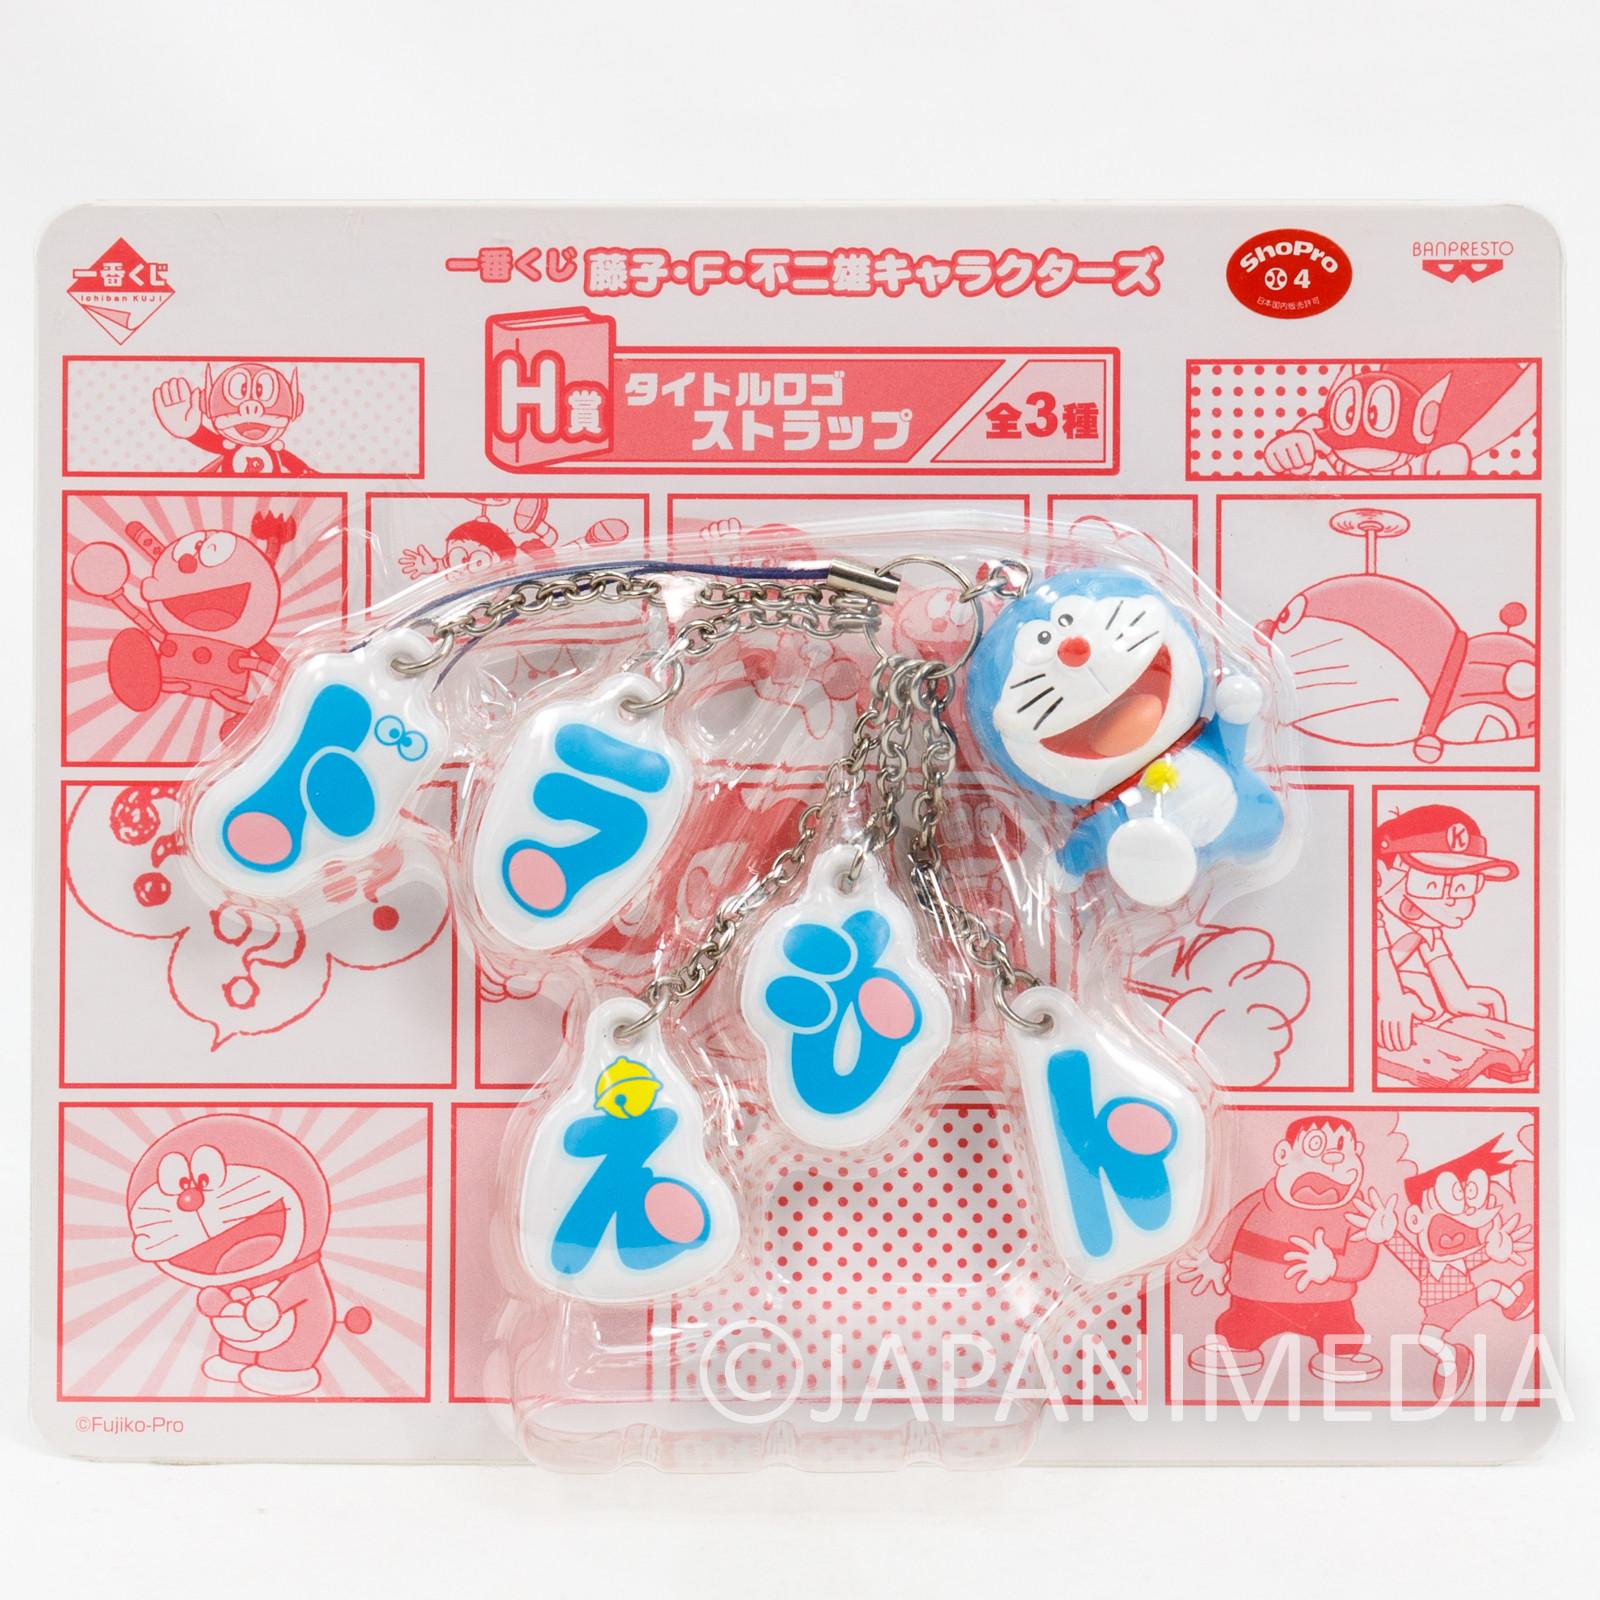 Doraemon Figure Mascot Strap Fujiko F Fujio JAPAN ANIME MANGA 2